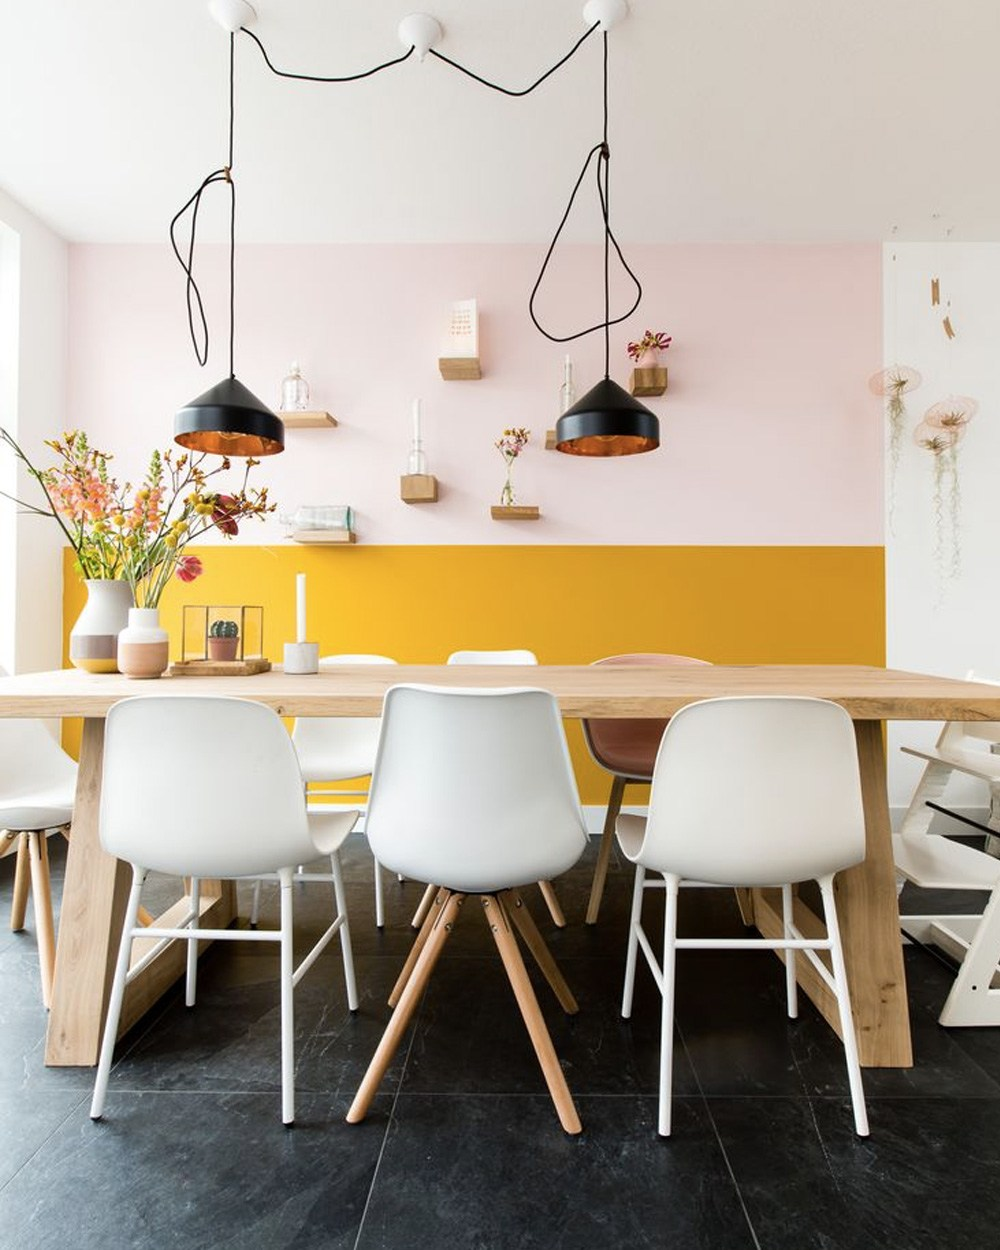 rose blush salle à manger style scandinave mur bicolore jaune - blog déco - clem around the corner